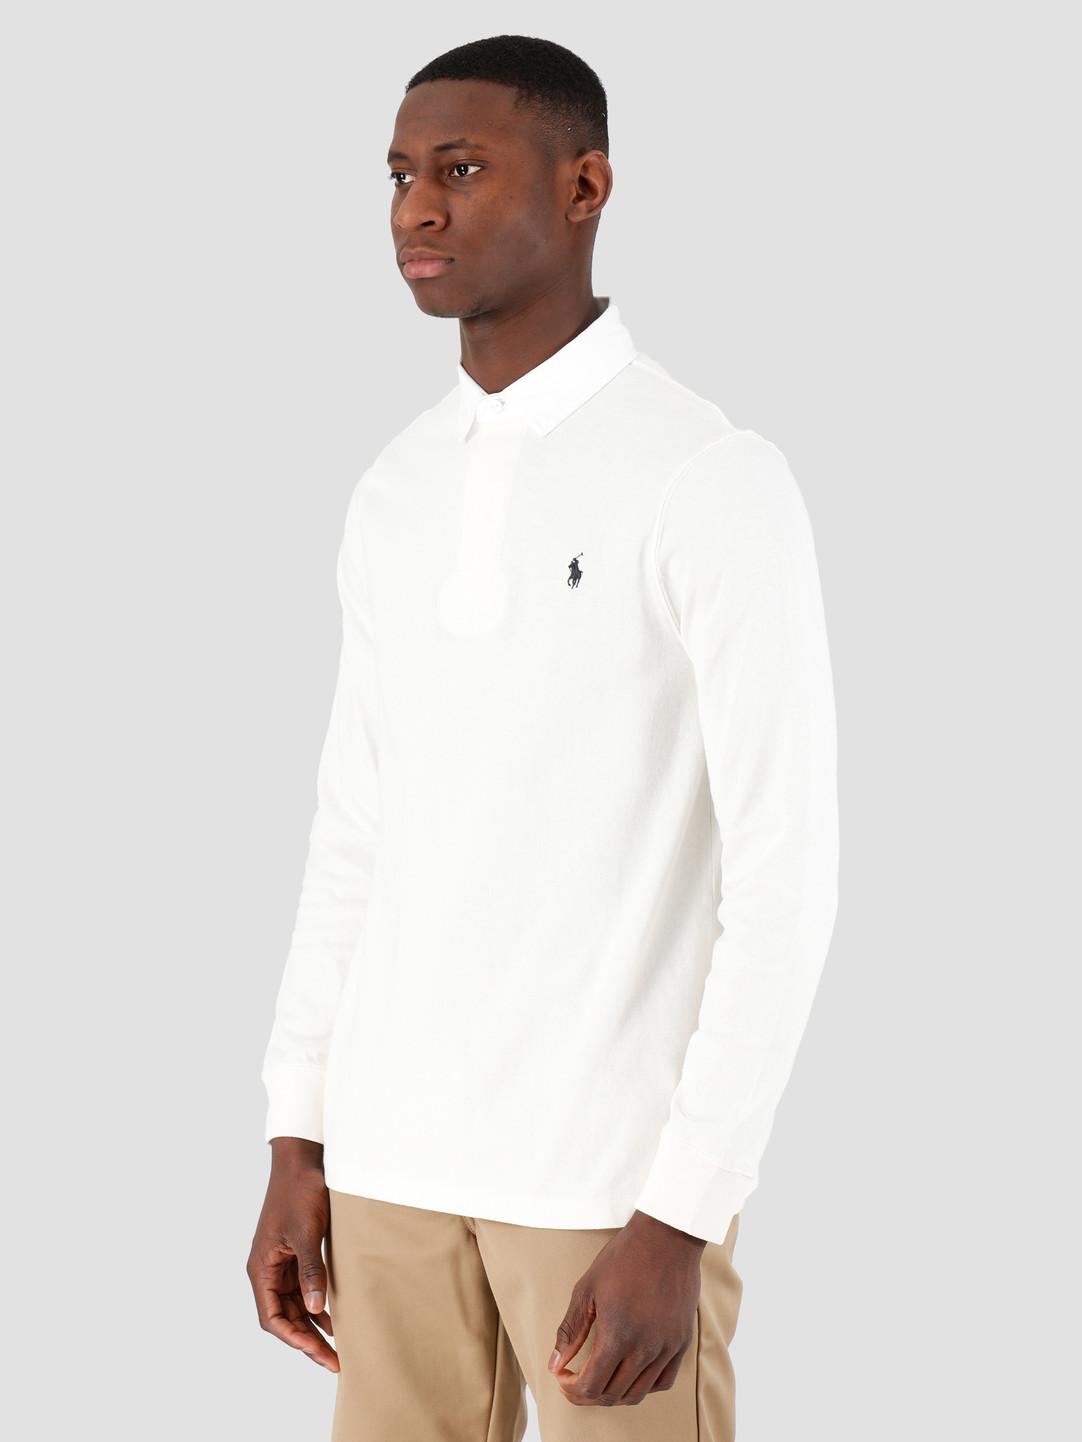 Polo Ralph Lauren Polo Ralph Lauren Ultw Rustic Polo Deckwash White 710799331001